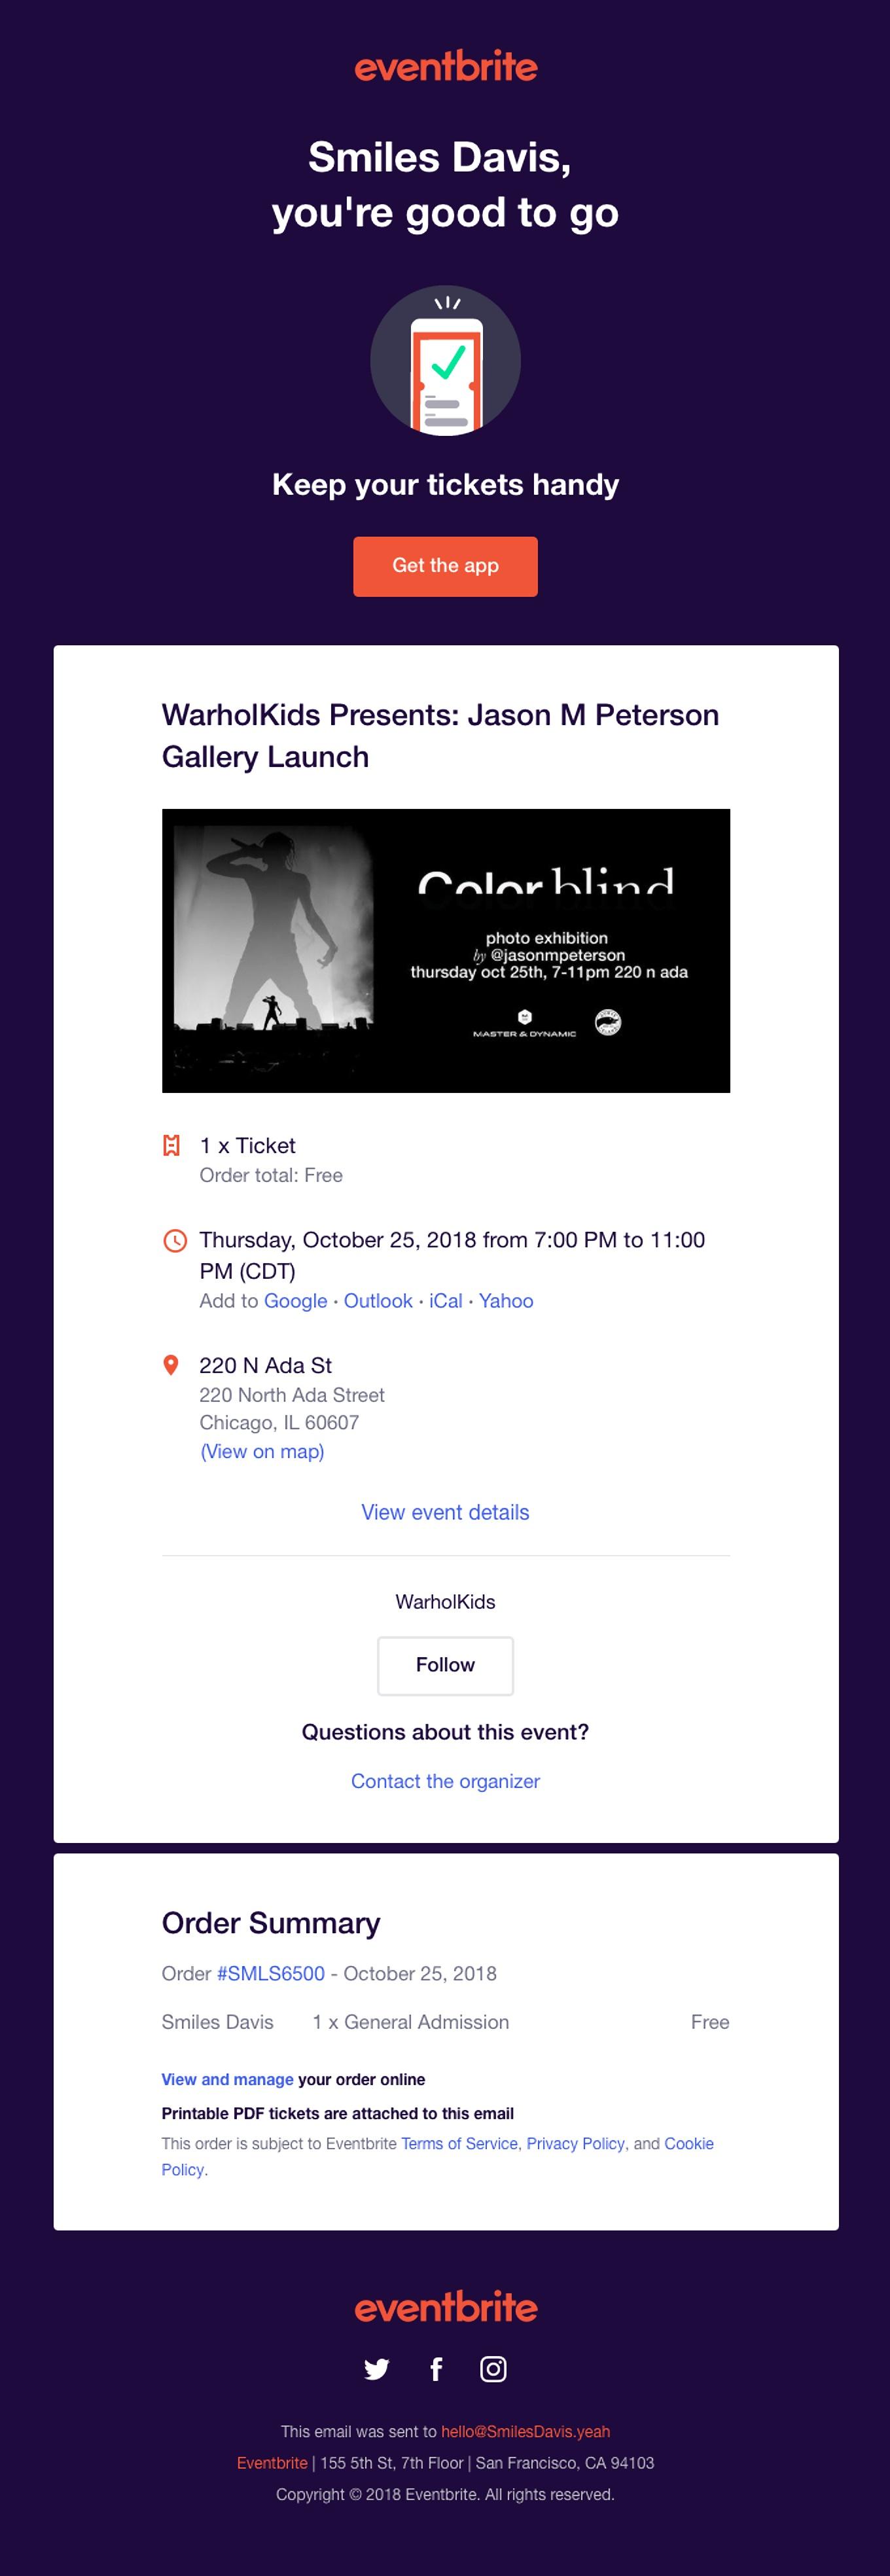 Eventbrite email confirmation